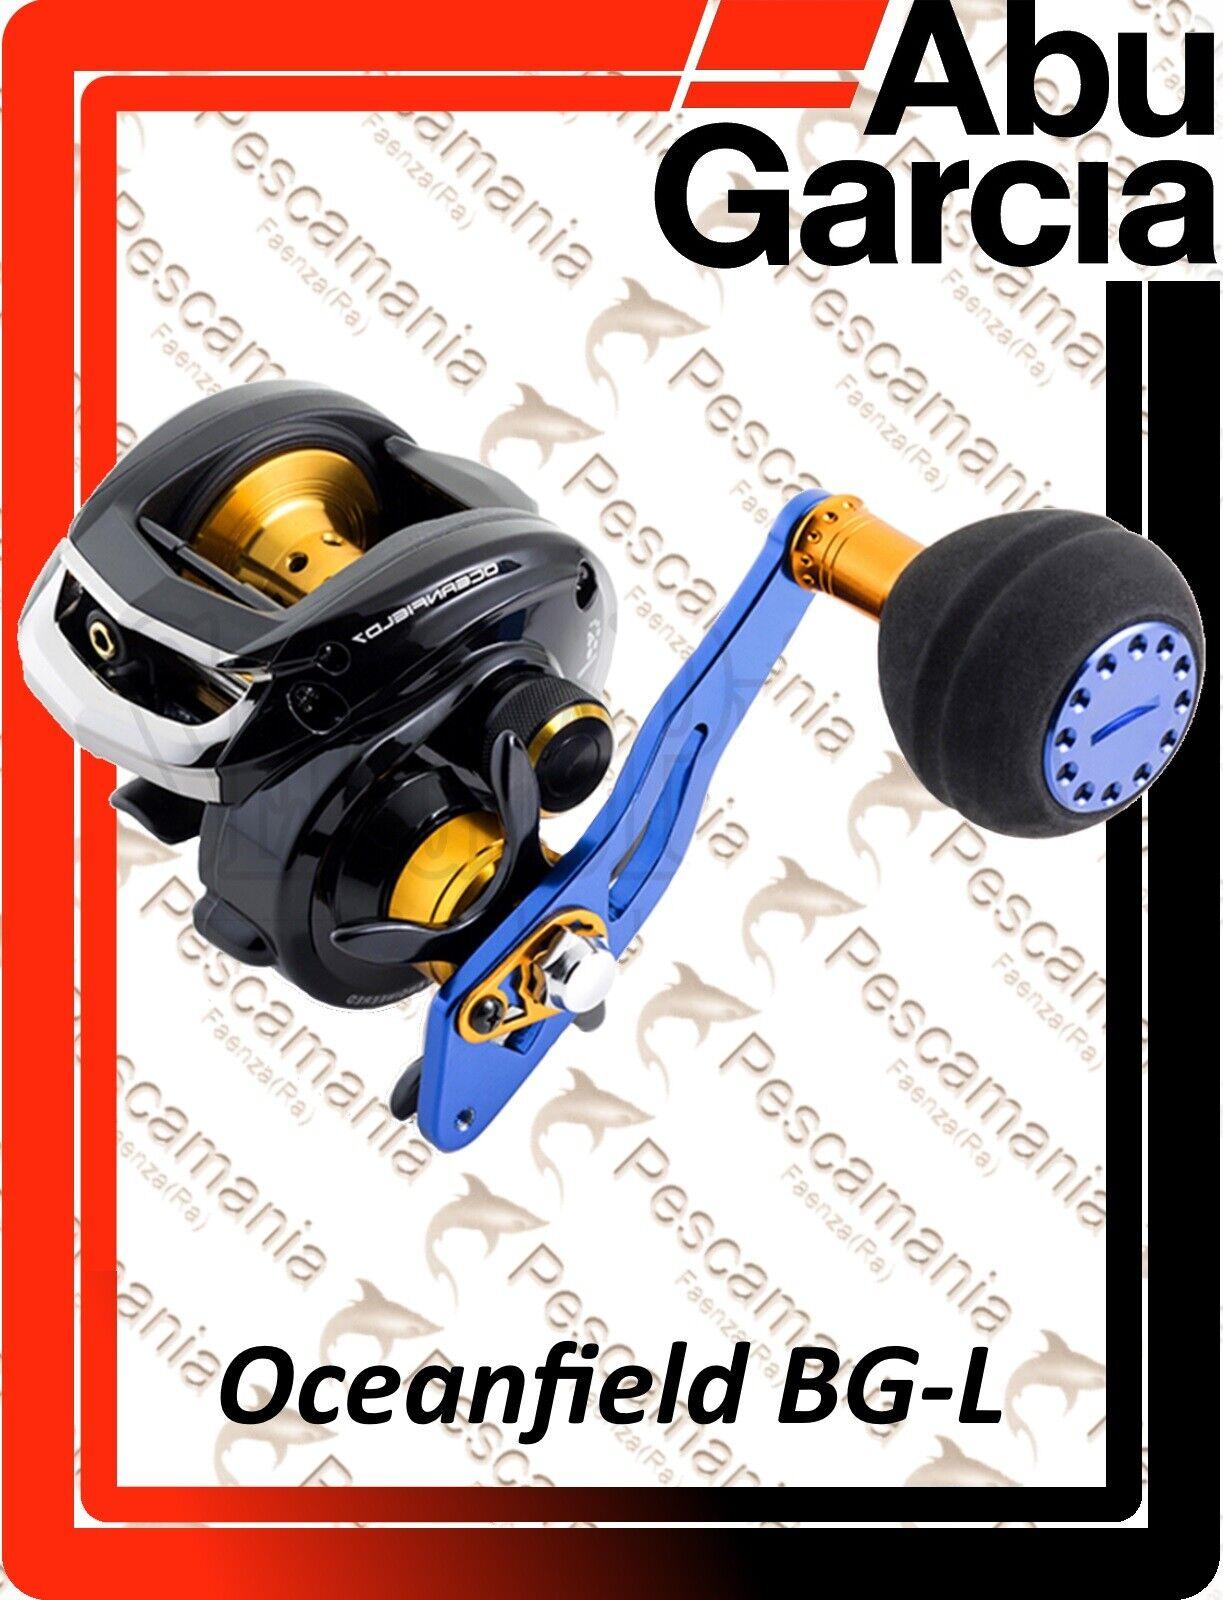 Mulinello casting Abu Garcia Oceanfield BGL Low Profile left